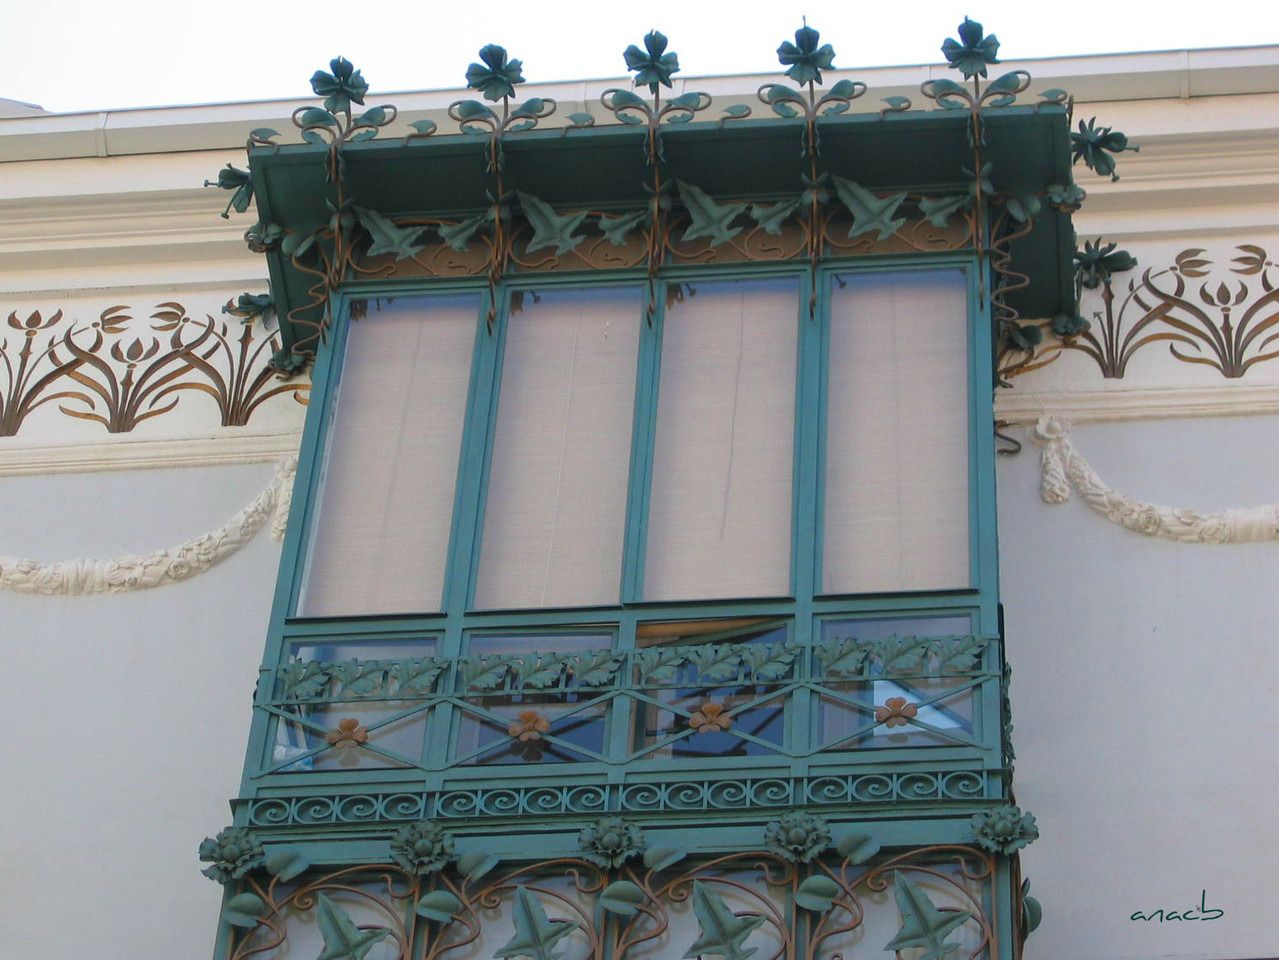 ao acaso #12 janela na Calle Santiago, em Valladol